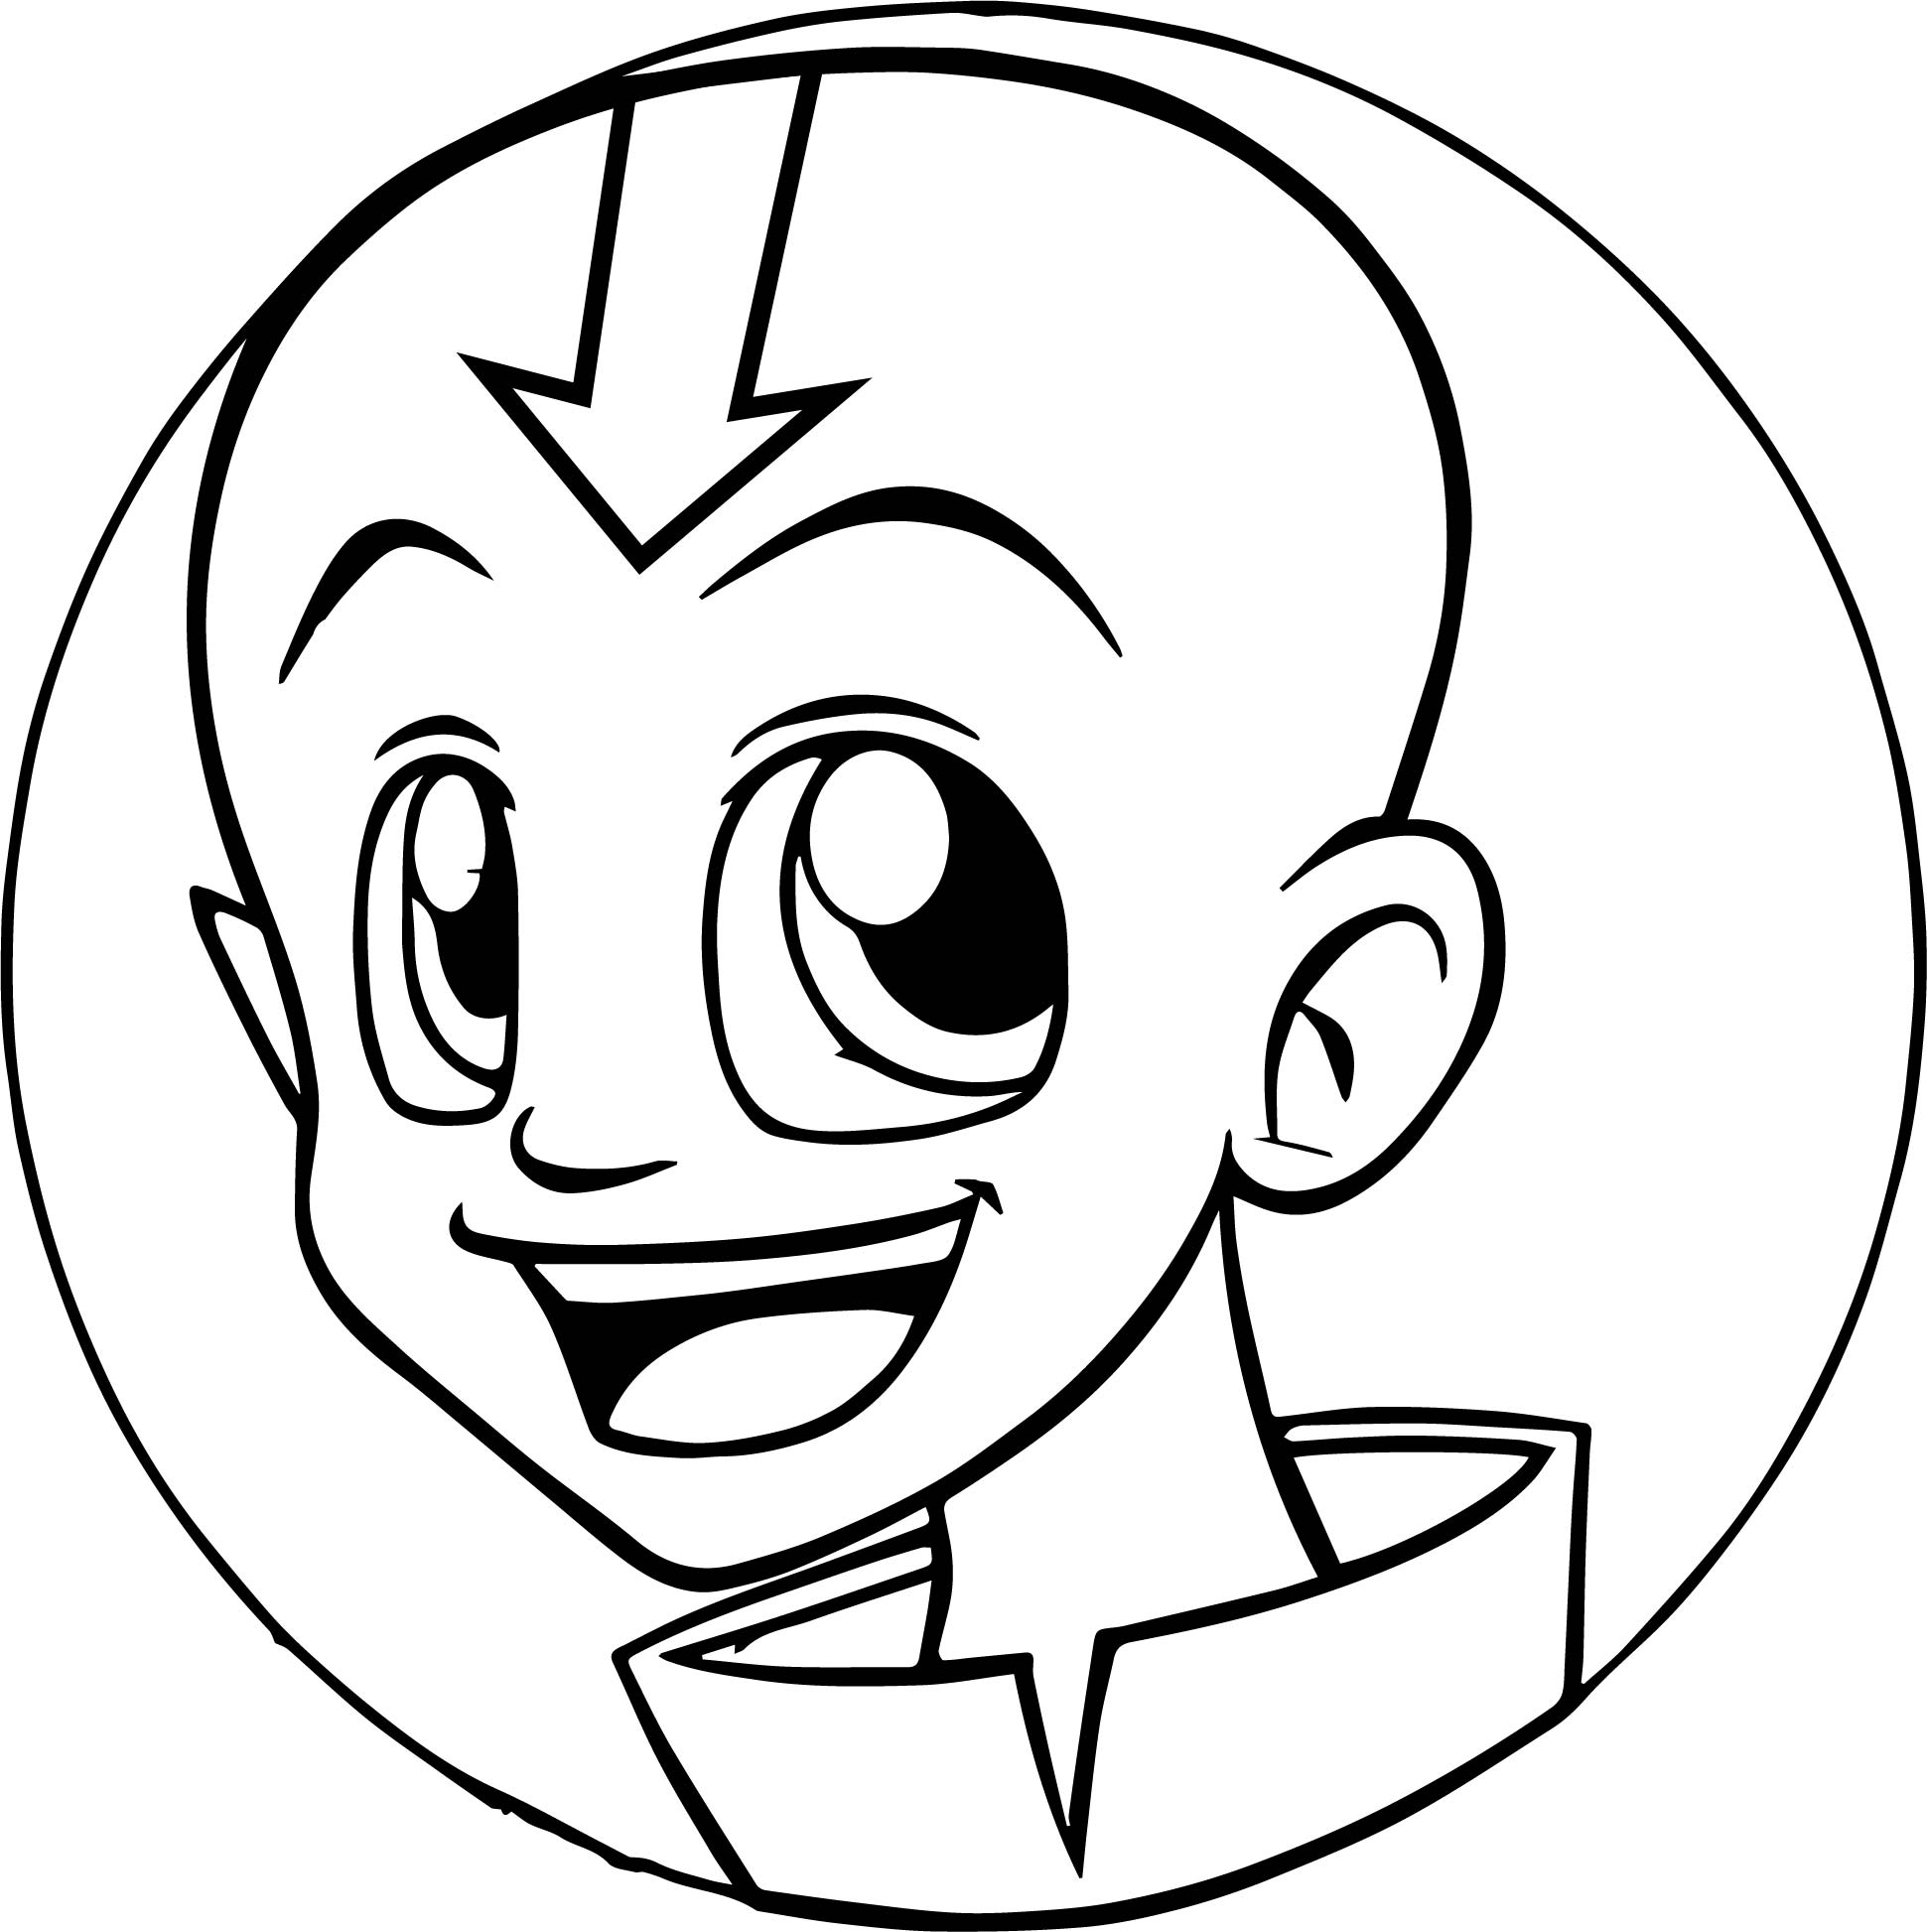 Aang xd avatar the last airbender coloring page for Avatar the last airbender coloring pages toph